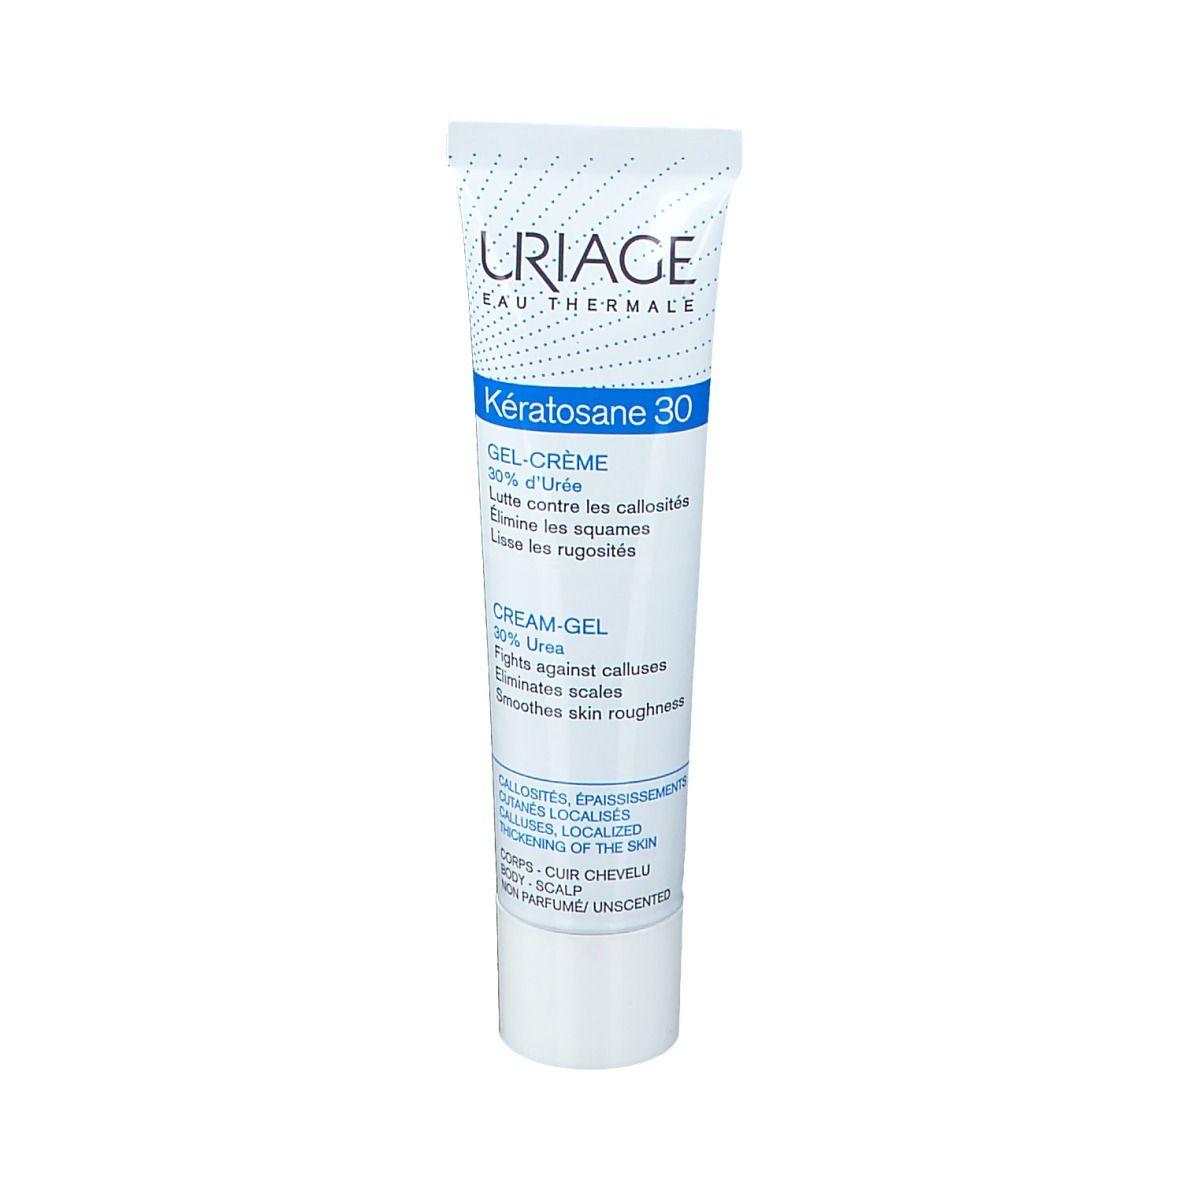 Uriage Kératosane 30 Gel-Crème